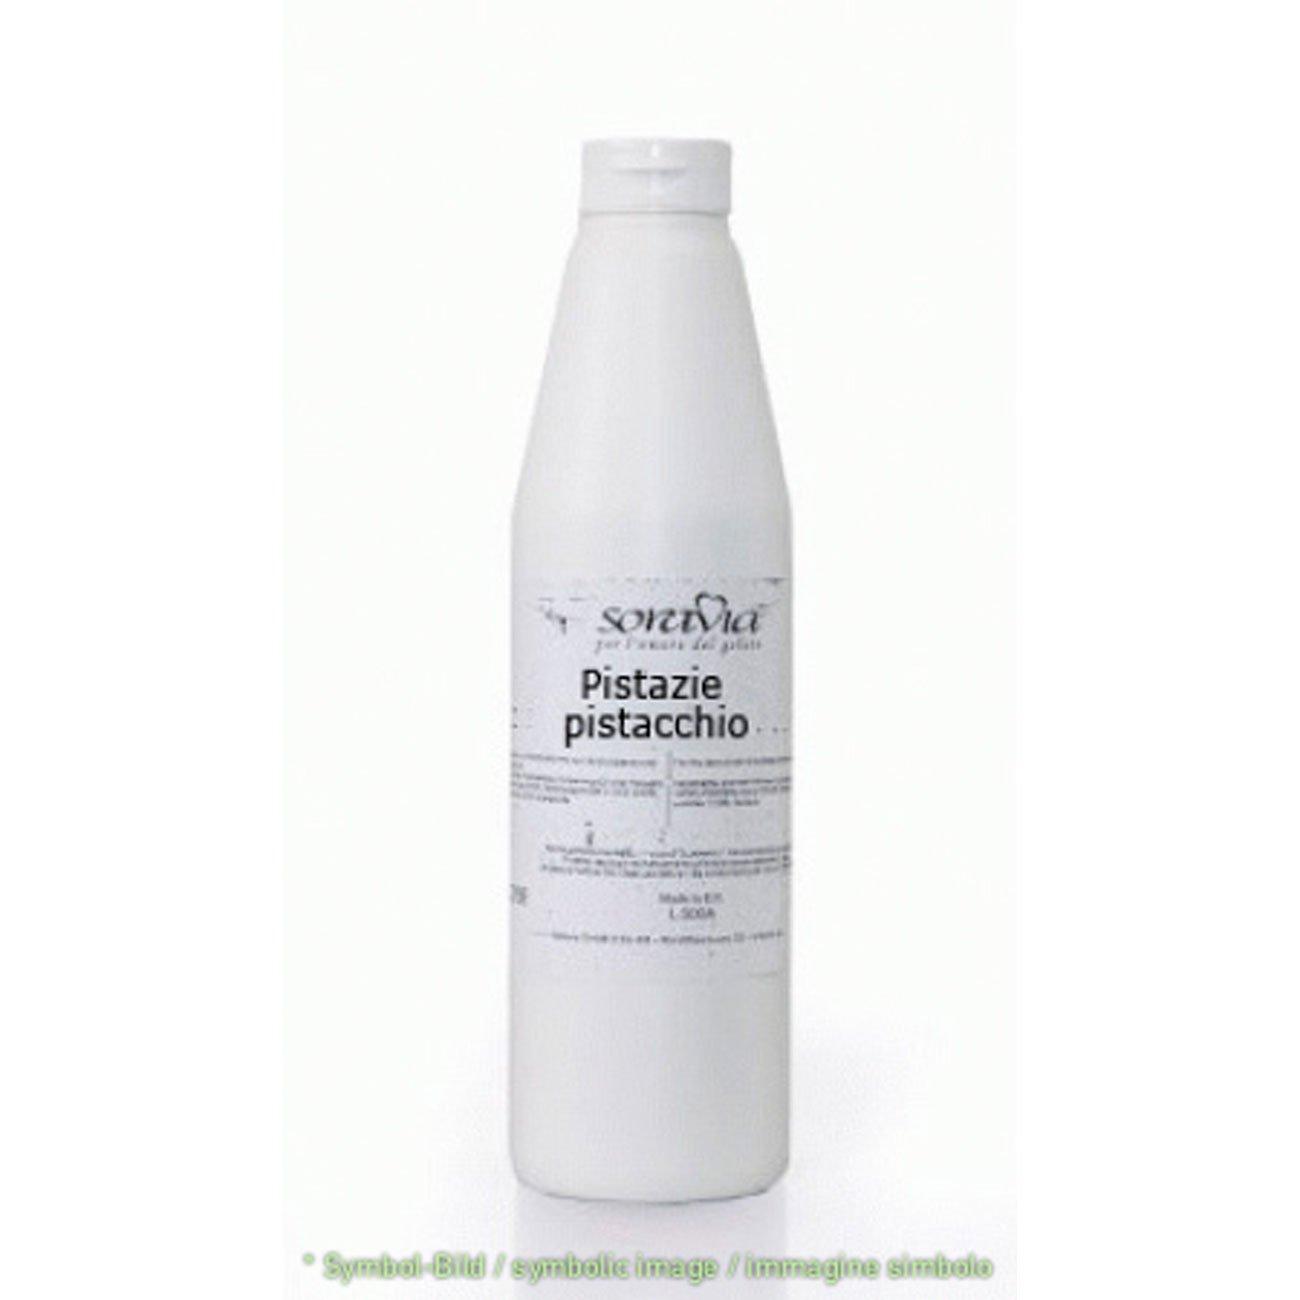 Pistazie / pistacchio - Flasche 1 kg - Eisflips Toppings